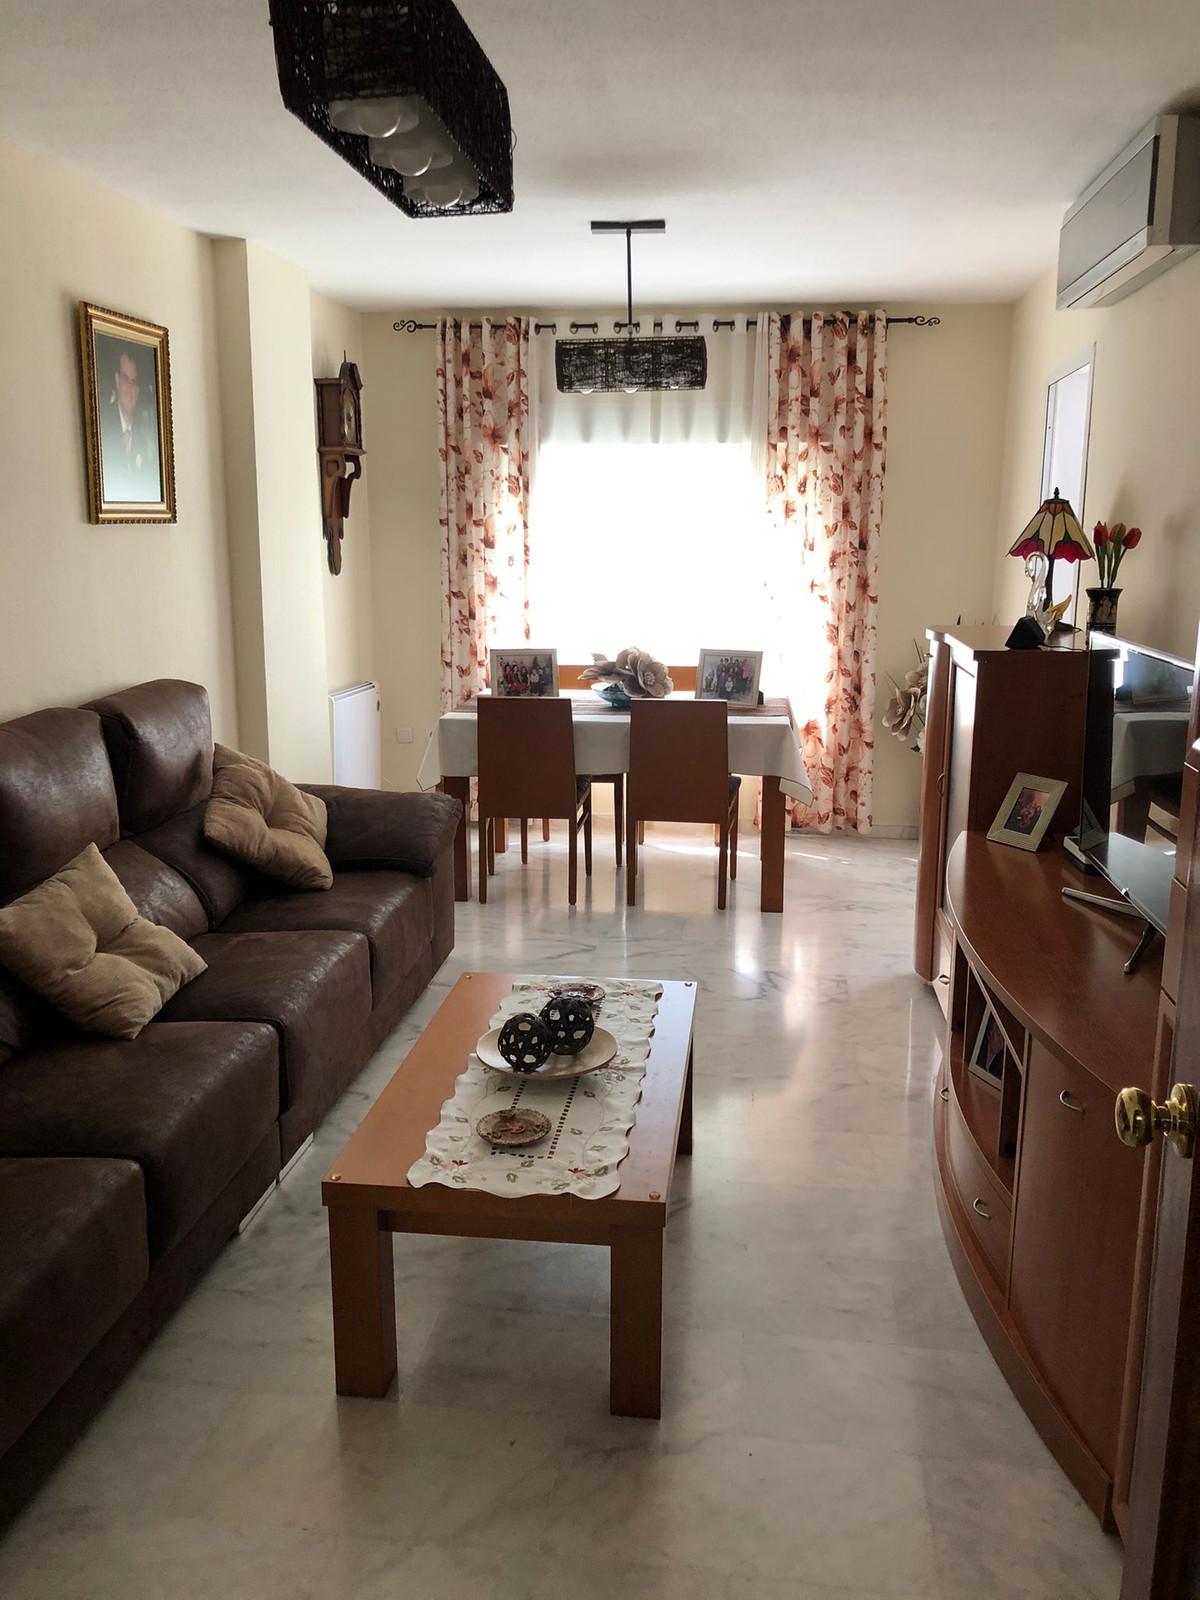 Middle Floor Apartment, Las Lagunas Mijas Costa, Costa del Sol. 3 Bedrooms, 2 Bathrooms, Built 127 m,Spain